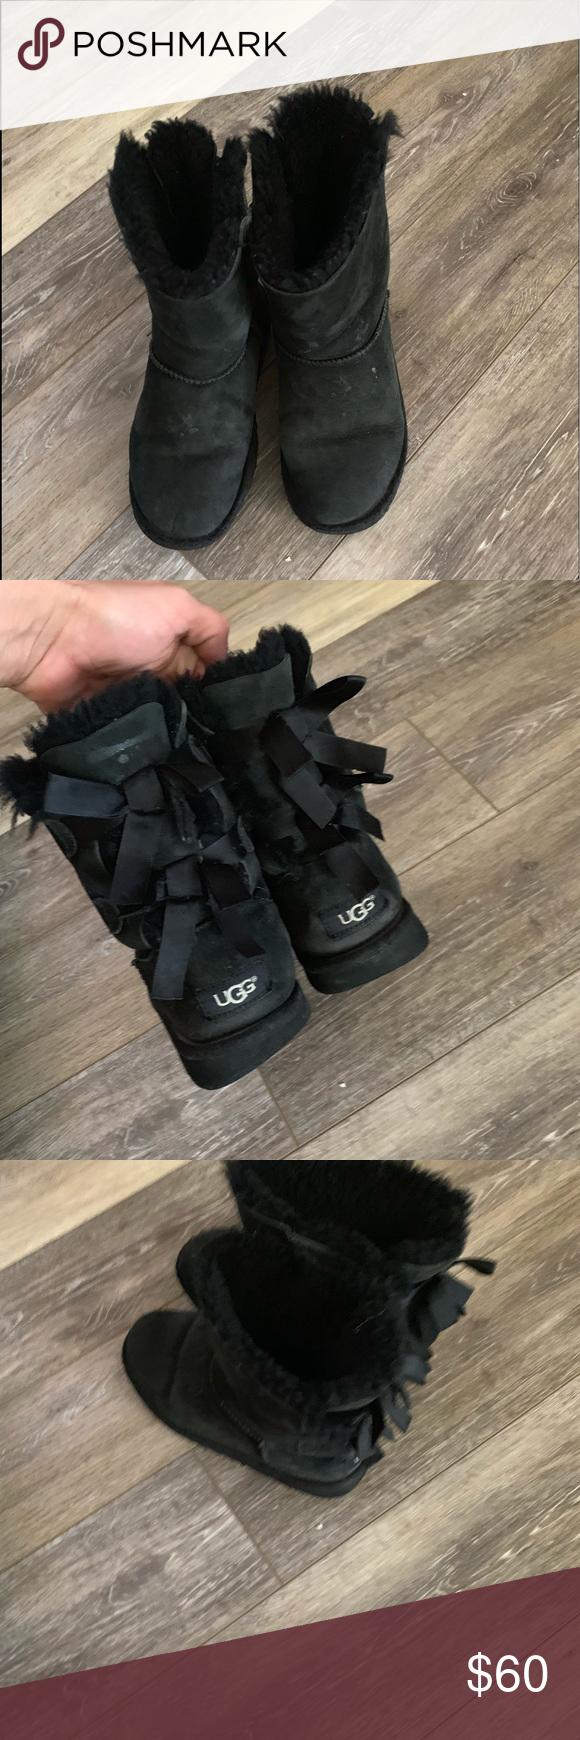 Ugg Bailey boot Black girls UGG Shoes Winter & Rain Boots #uggbootsoutfitblackgirl Ugg Bailey boot Black girls UGG Shoes Winter & Rain Boots #uggbootsoutfitblackgirl